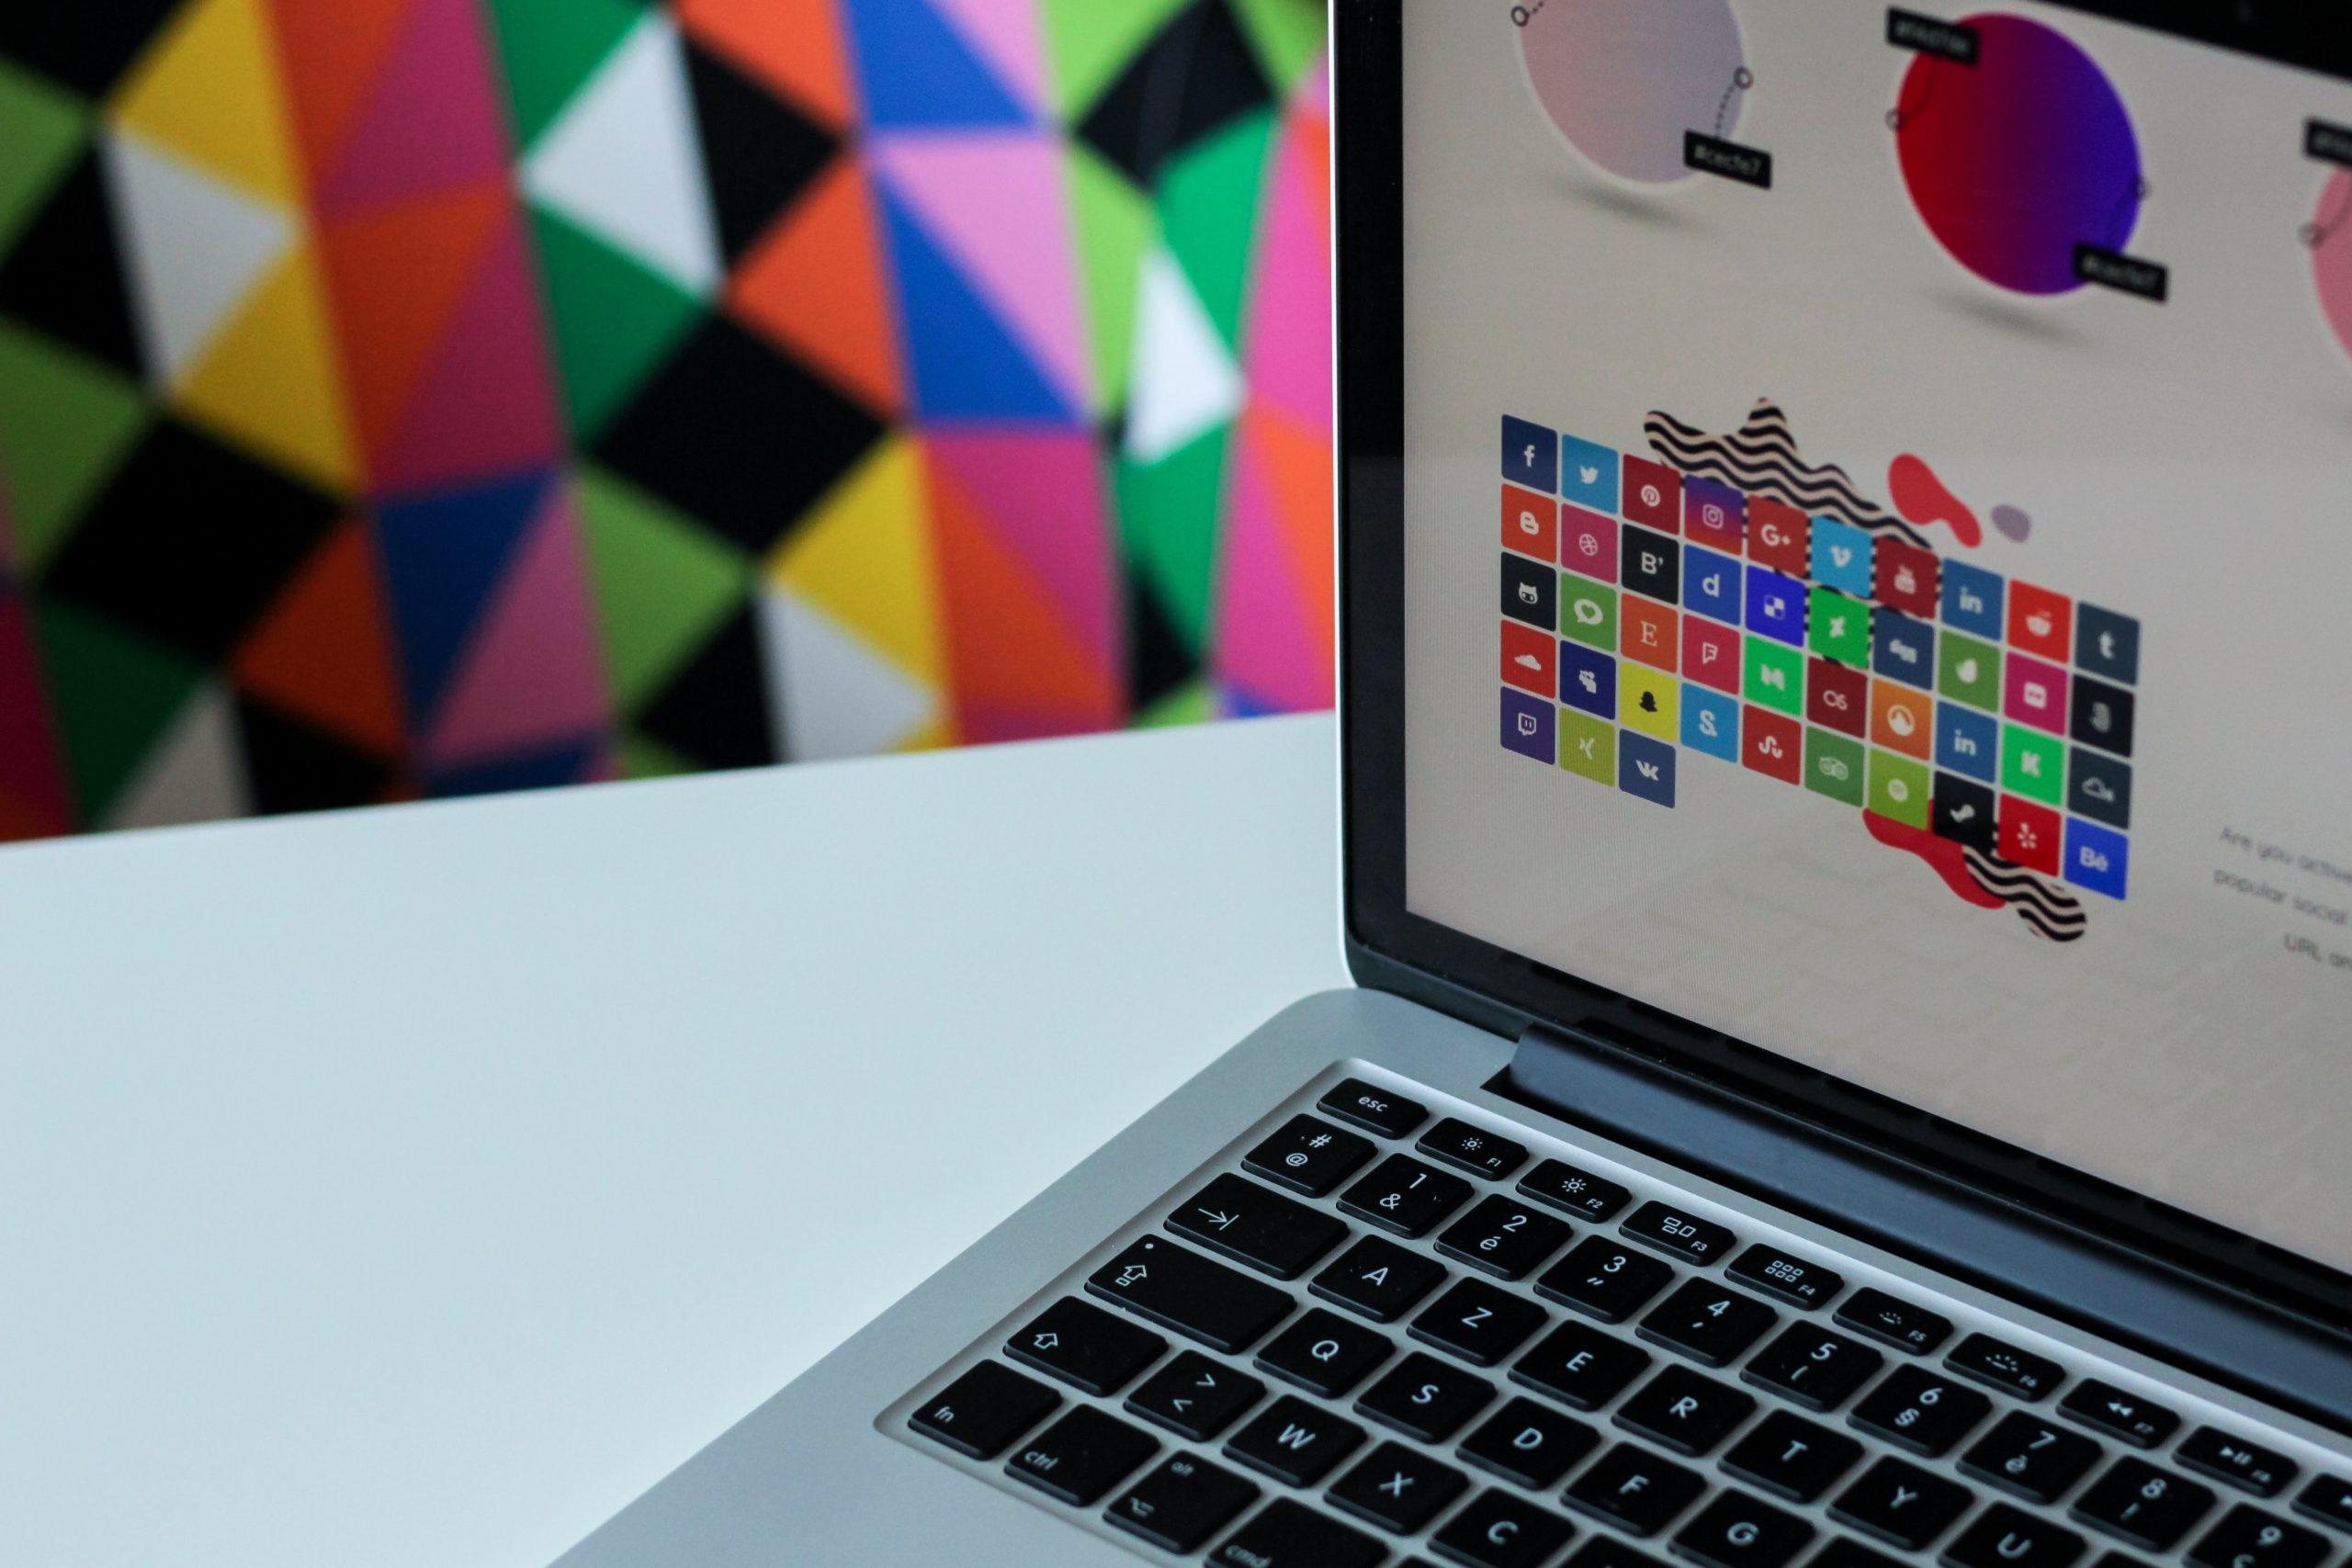 HawkSEM: How to Increase Conversions Through Website Design